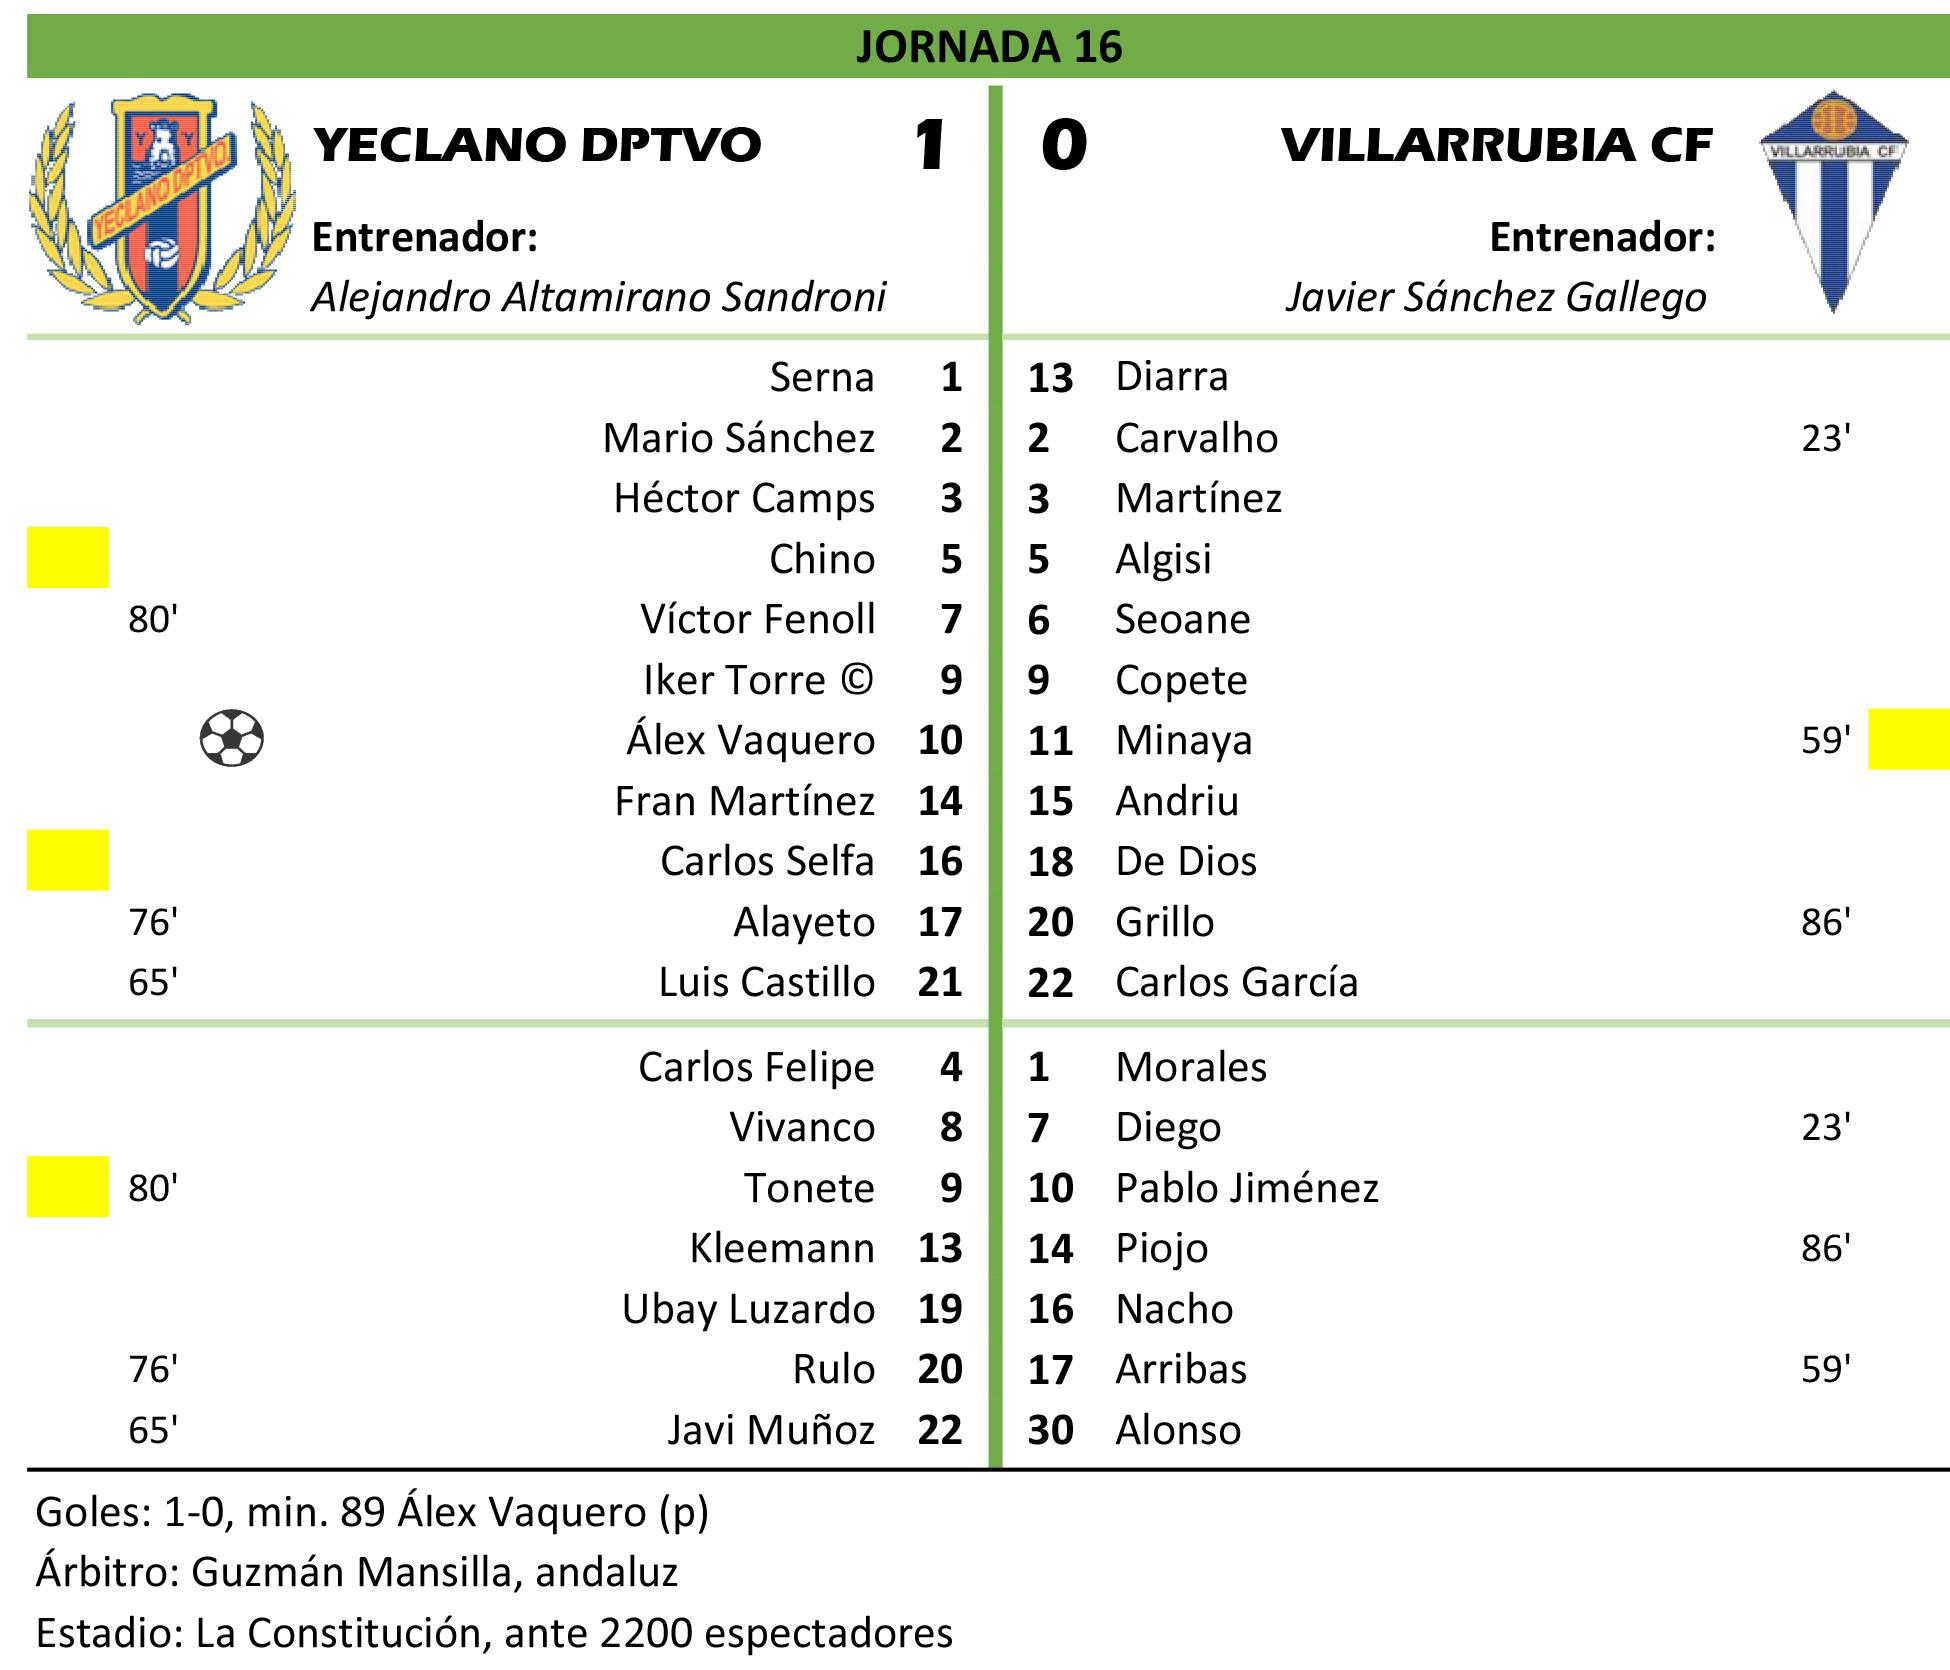 YeclaSport_Ficha_Yeclano_Villarrubia